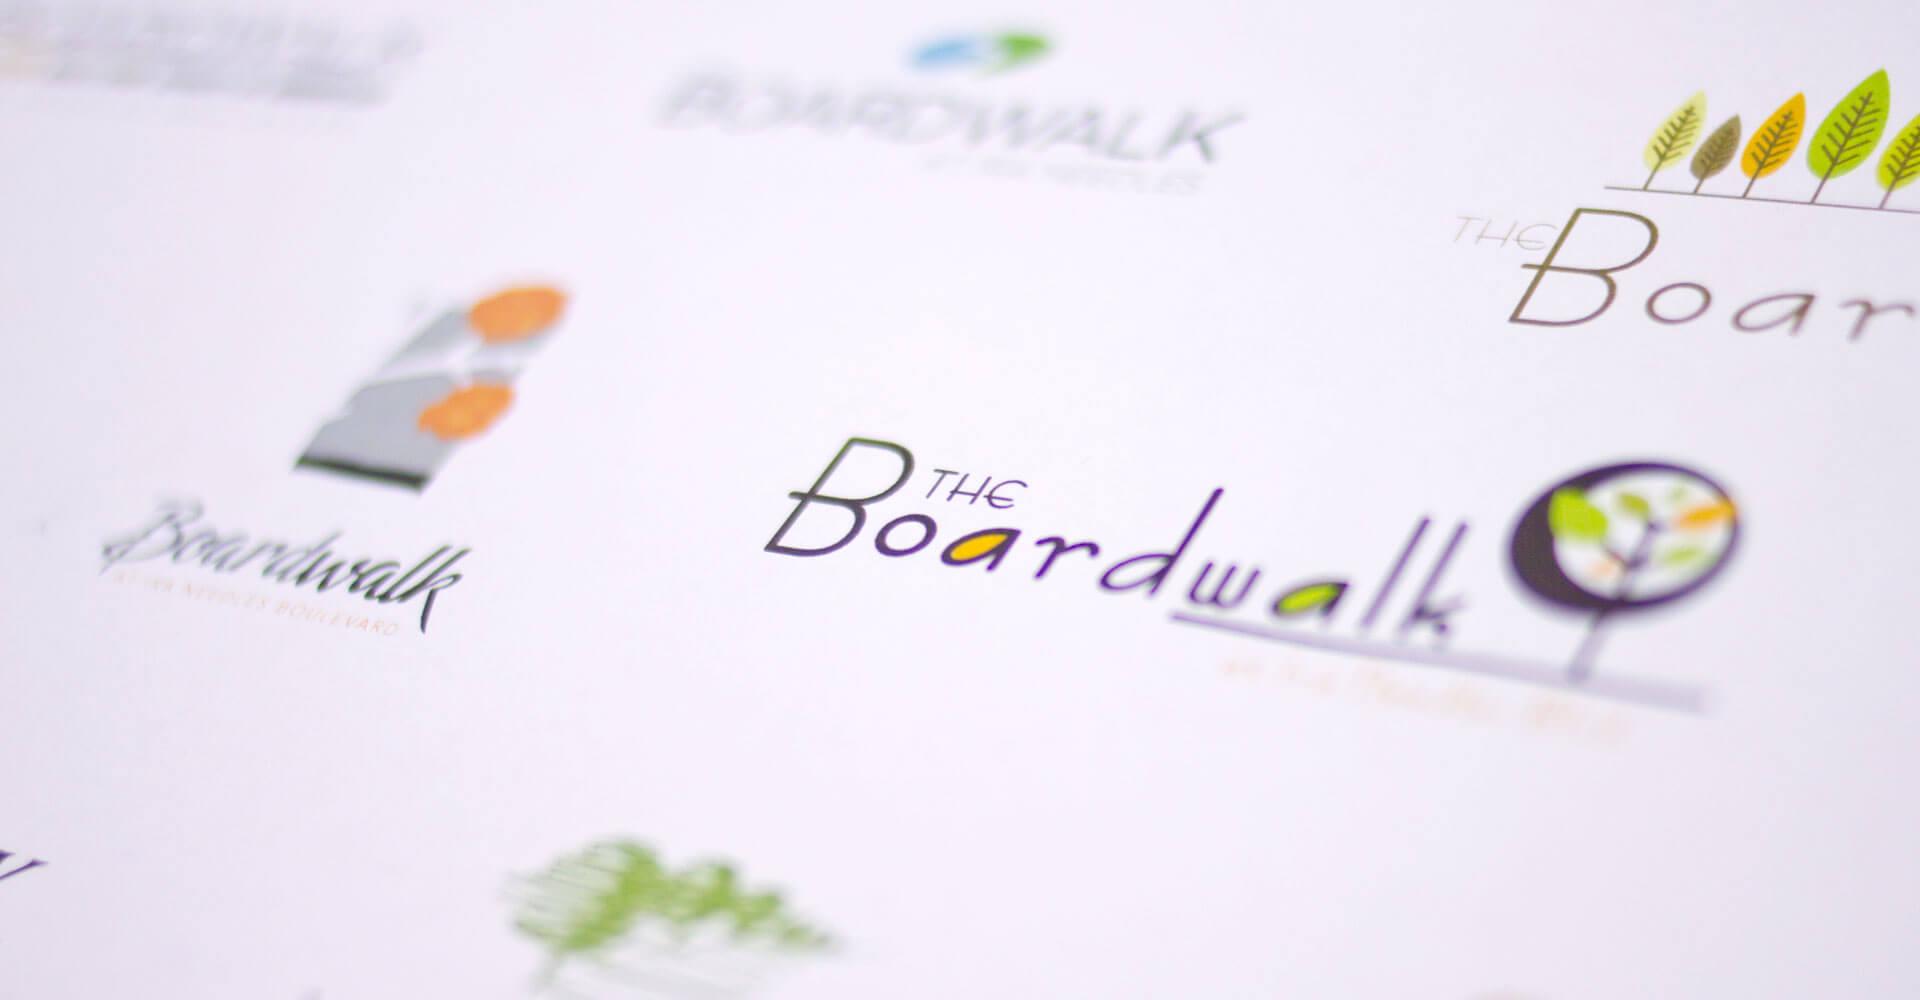 The Boardwalk at Ira Needles